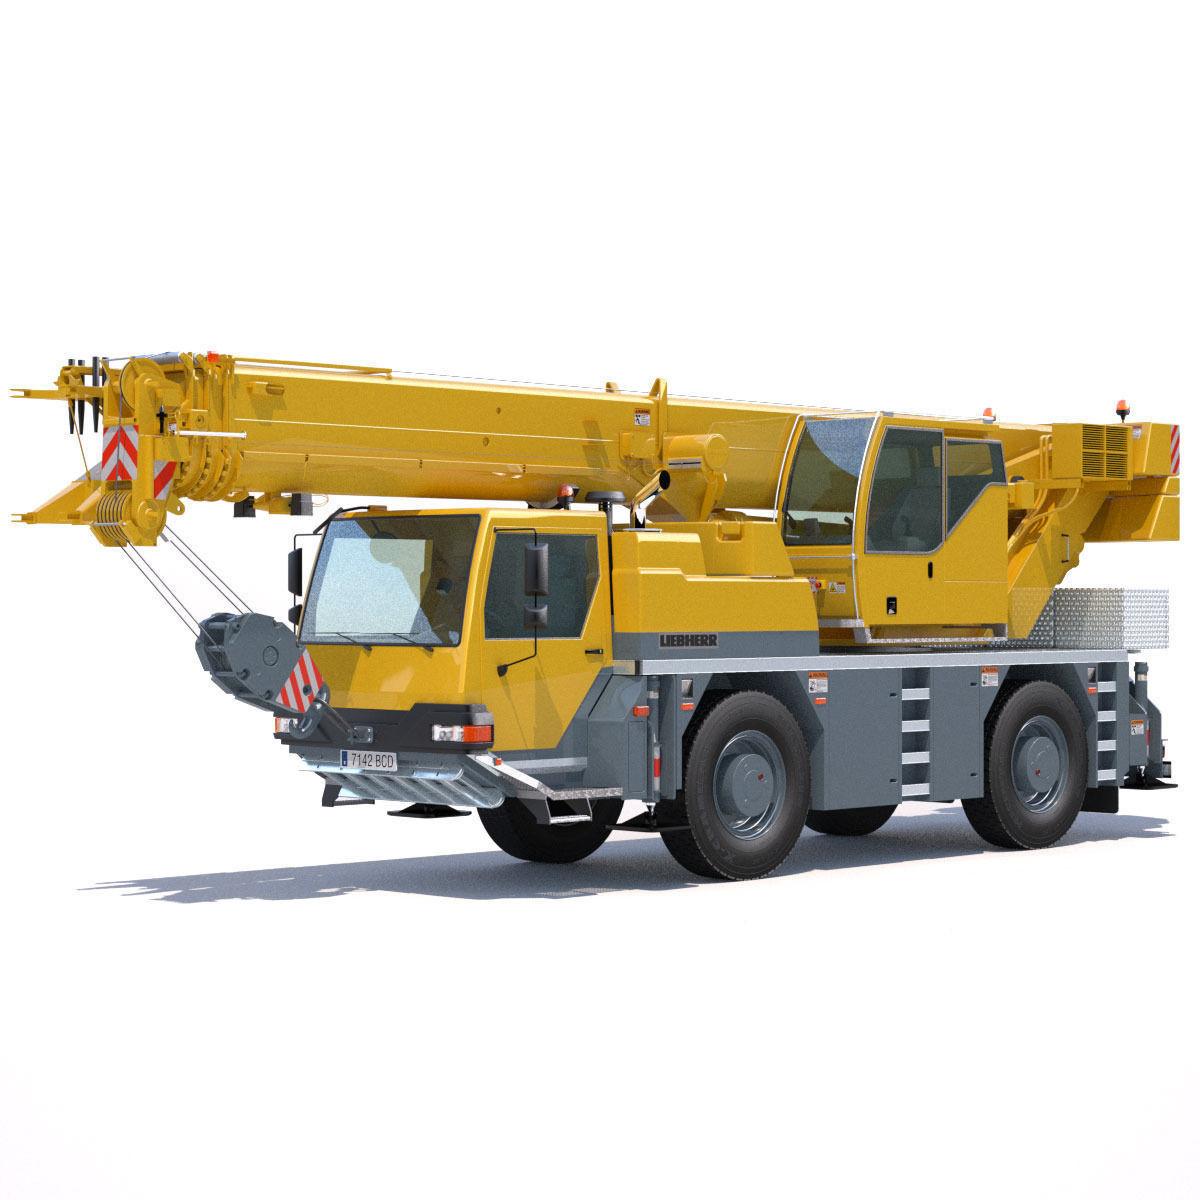 Mobile Crane Liebherr LTM 1040 2 1